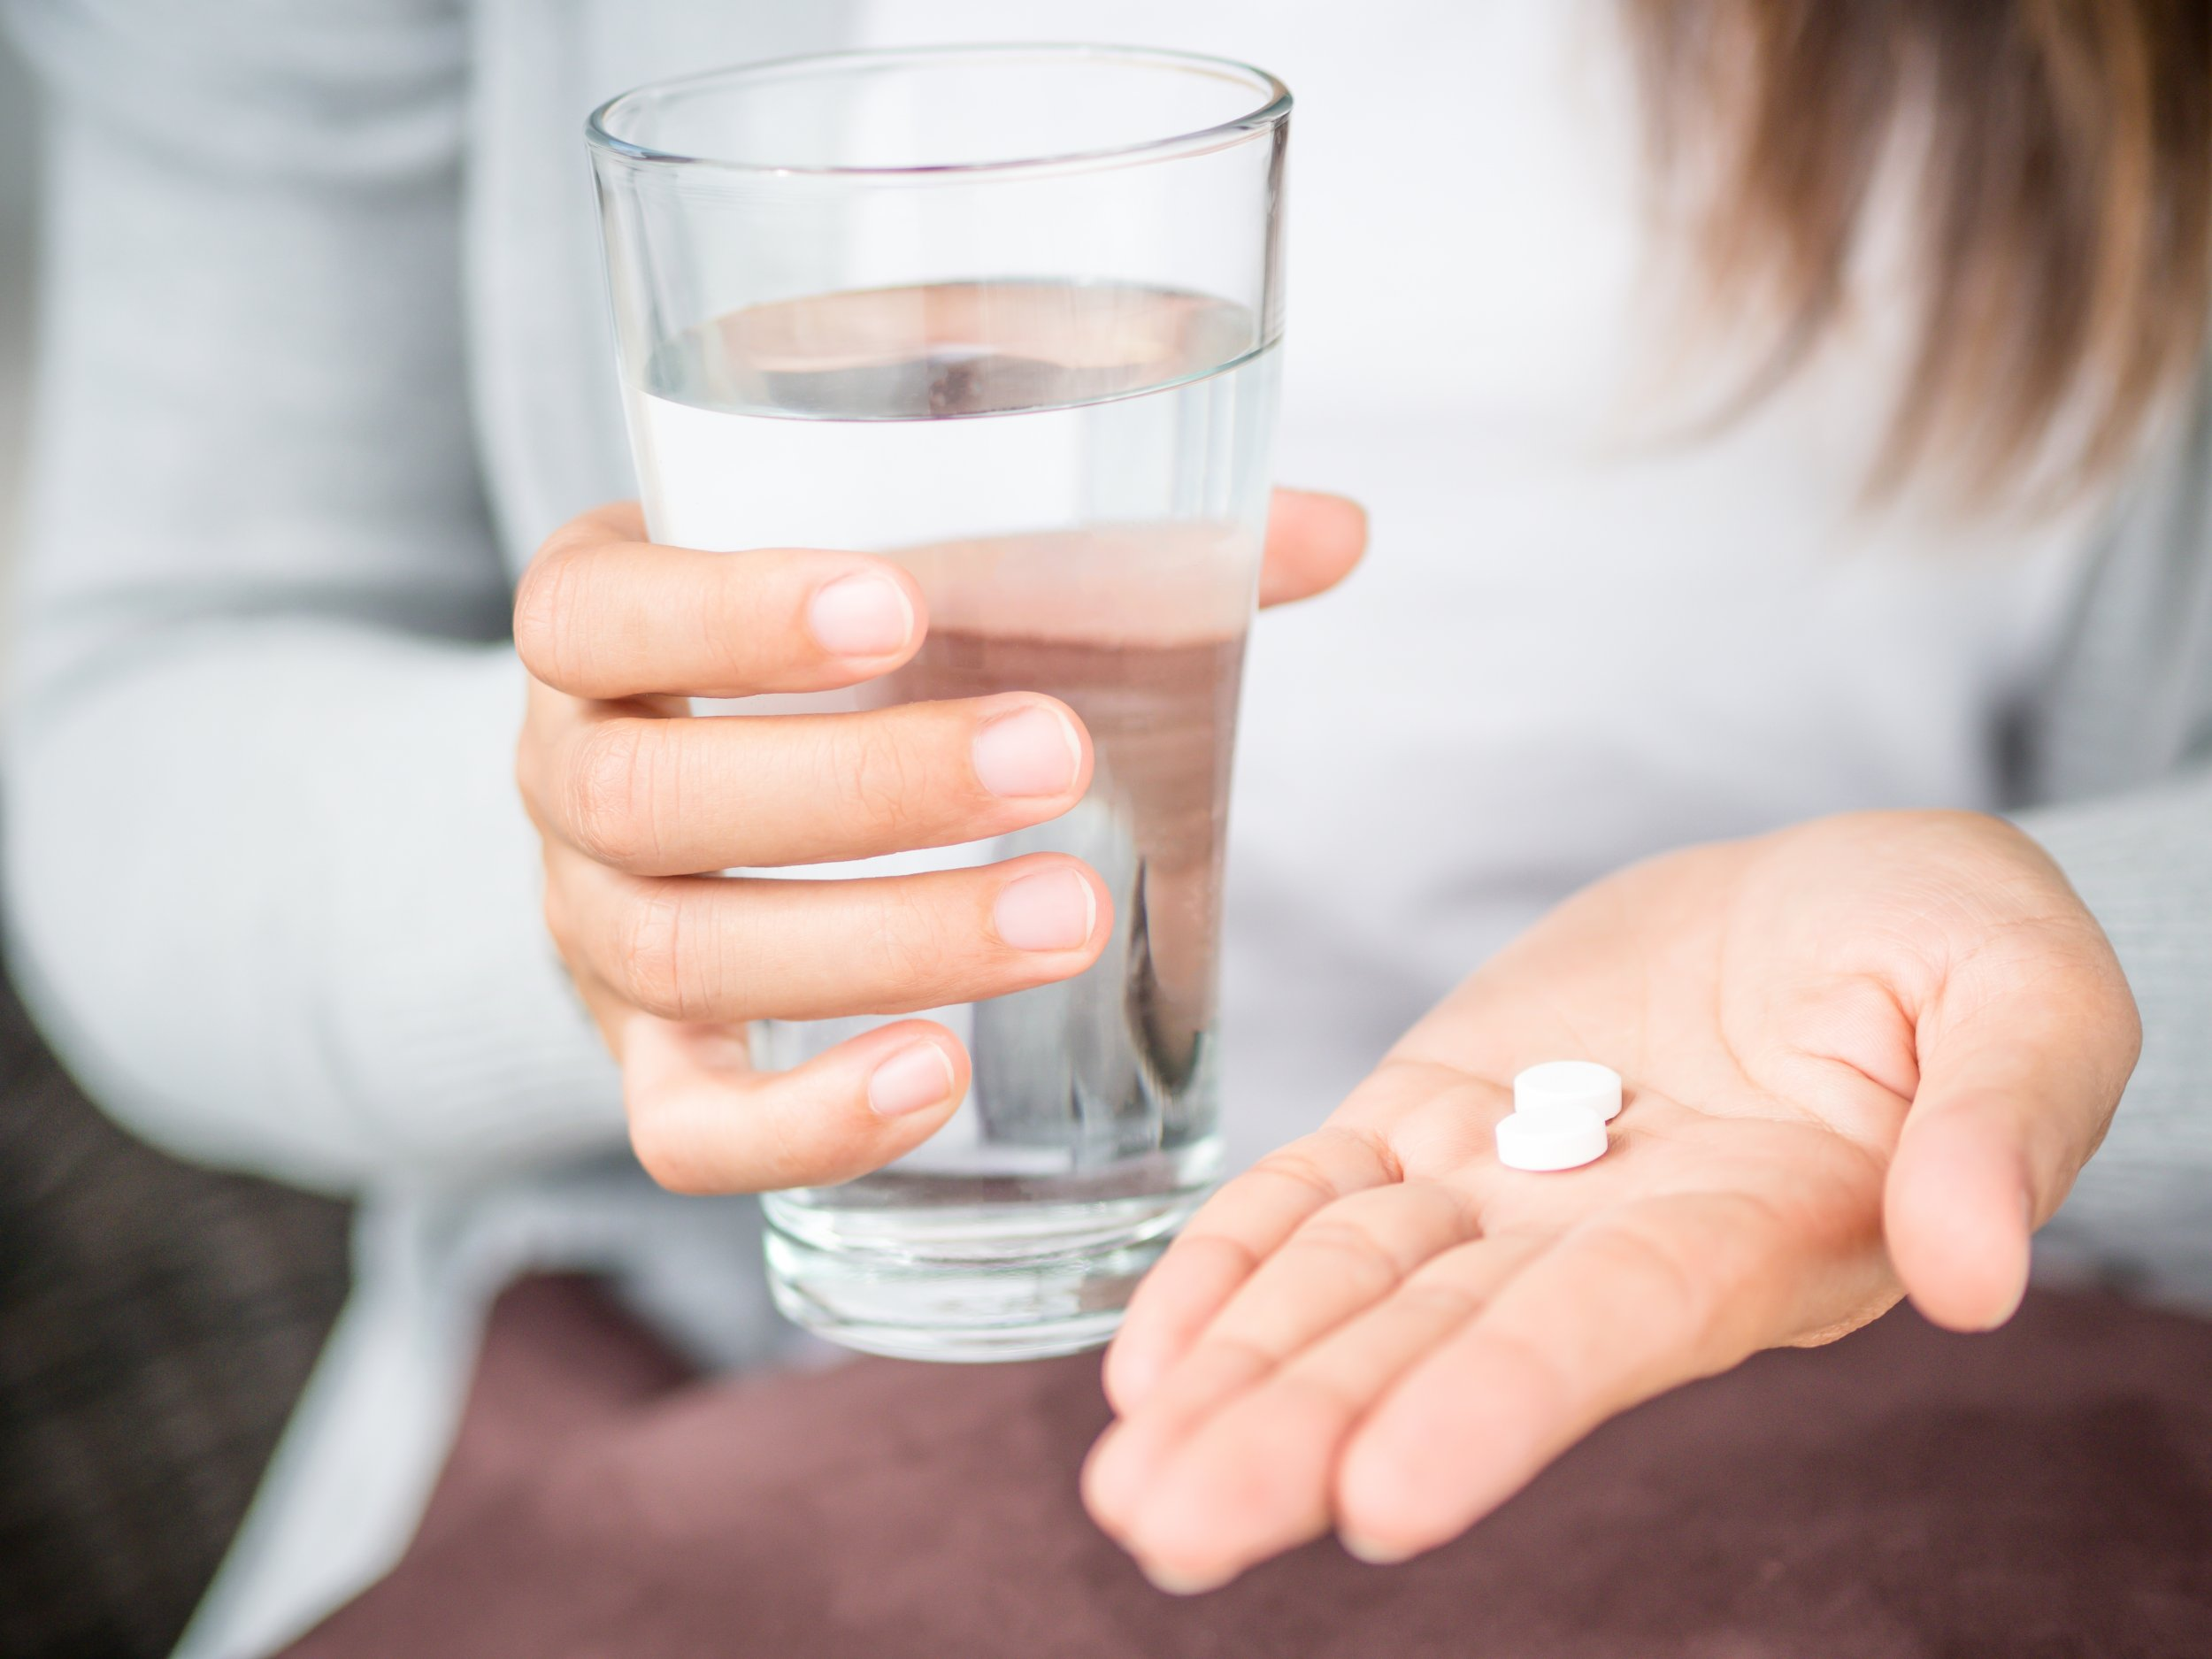 drug woman hand medicine getty stock